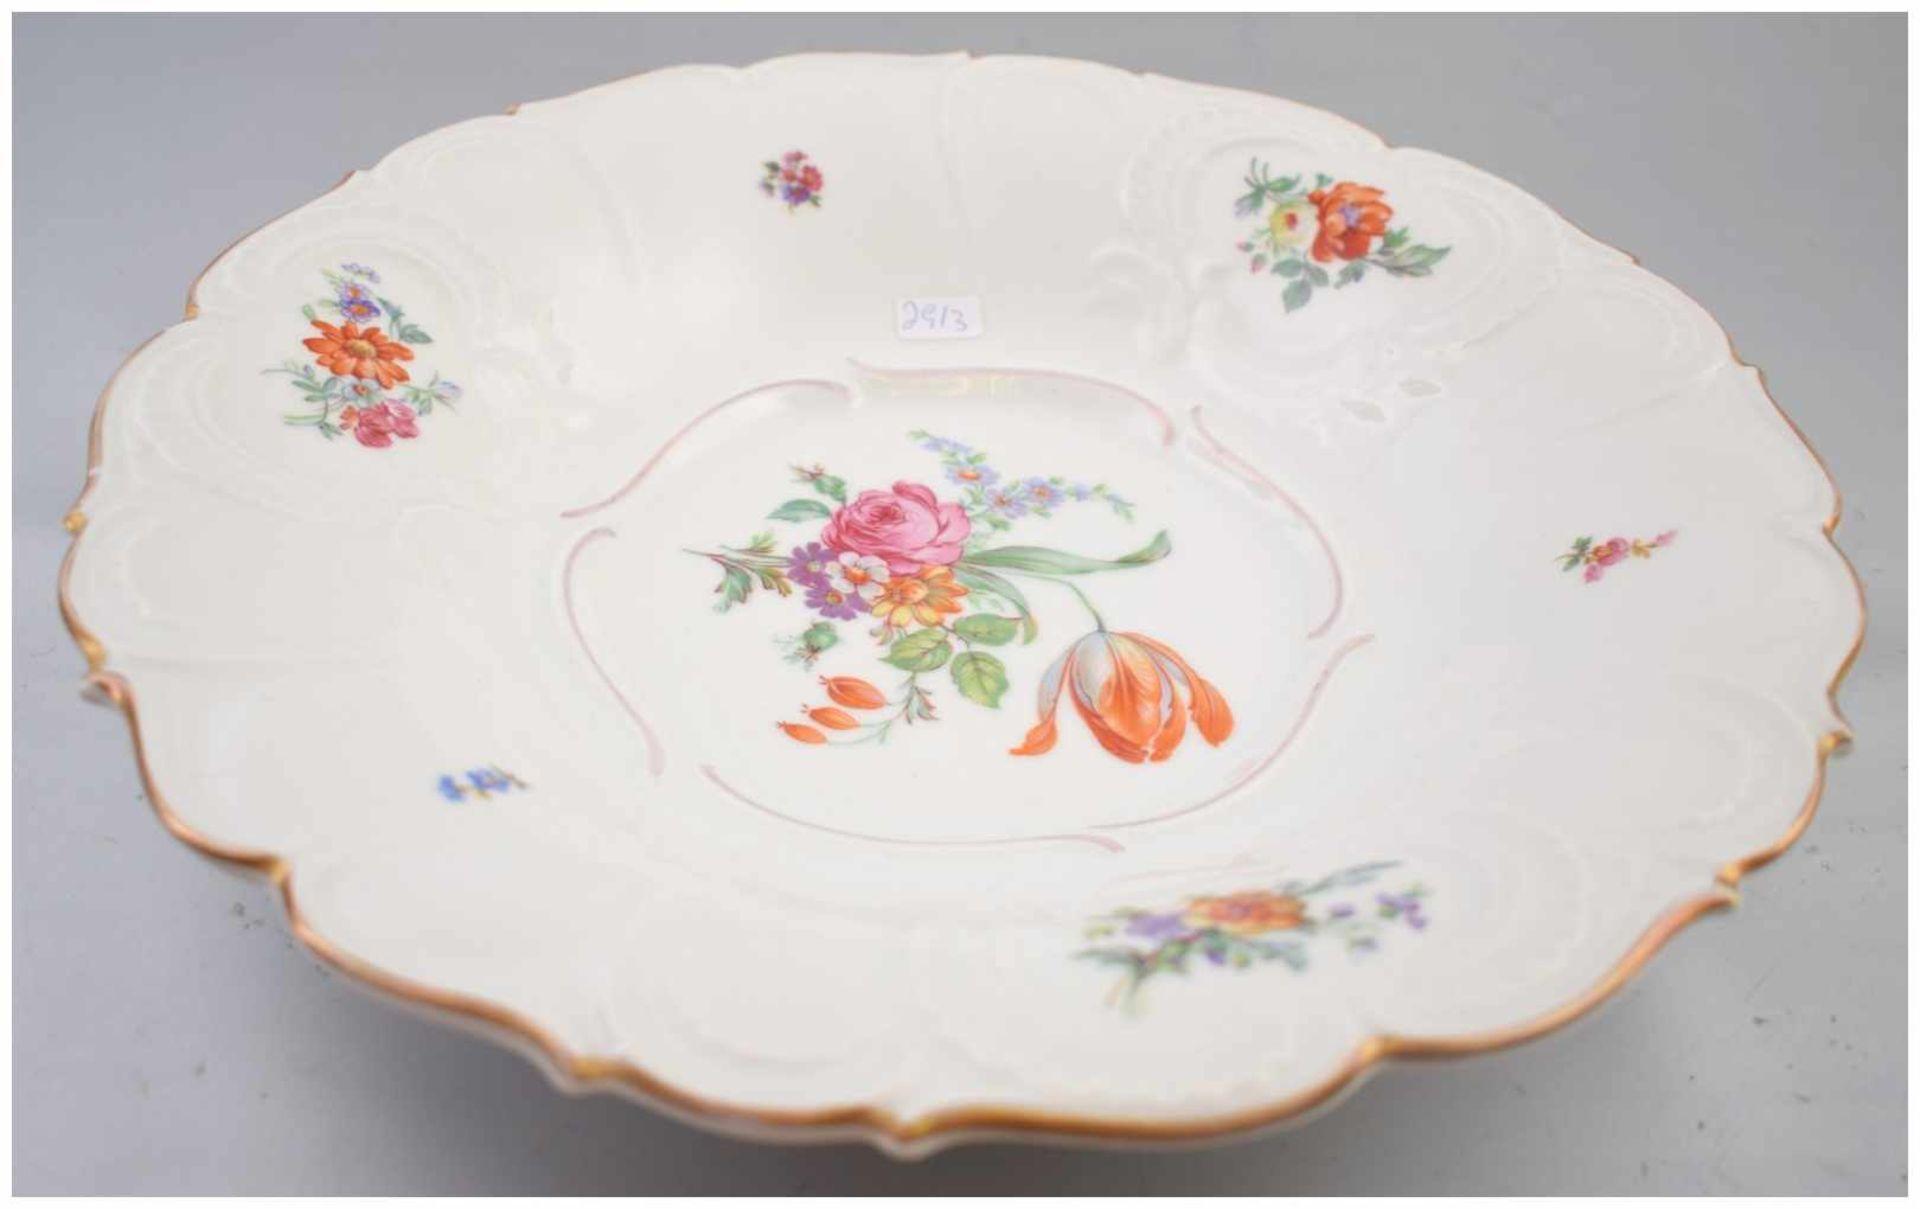 Los 50 - Wandteller Goldrand, mit Barock-Ornamenten verziert, Spiegel mit bunter Blumenbemalung, Dm 29 cm, FM